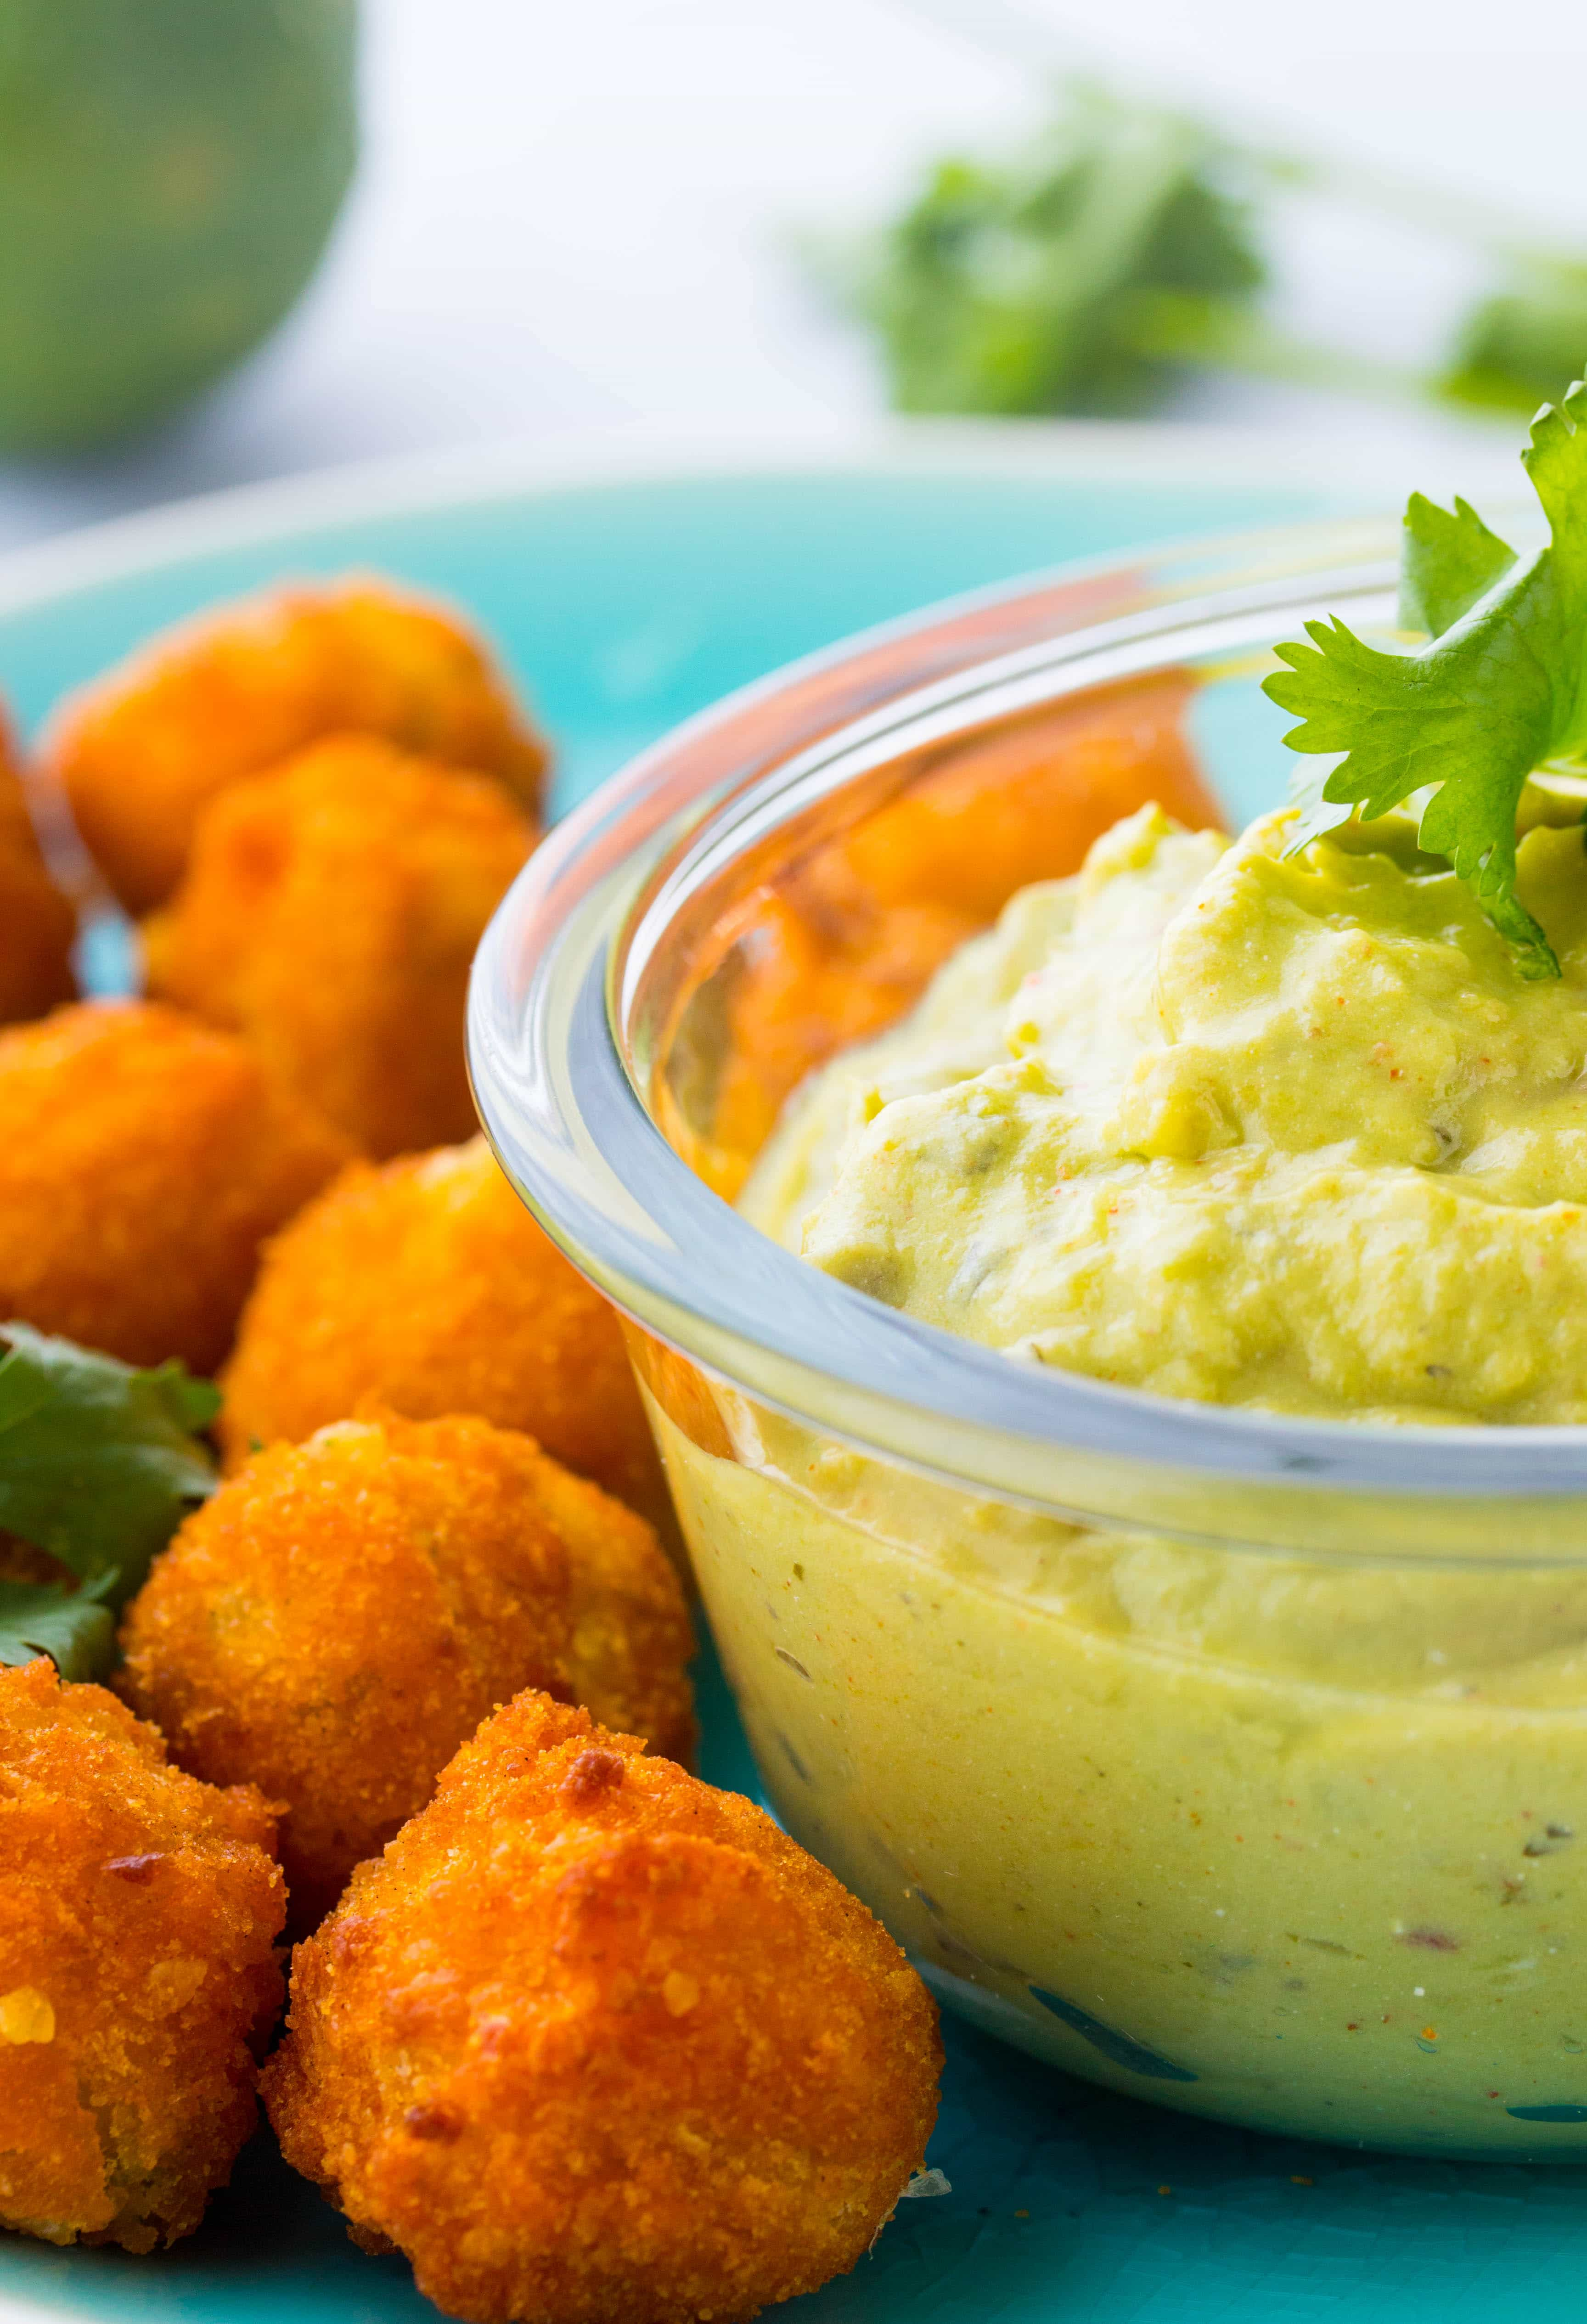 Recipe for Guacamole Dip with Sour Cream